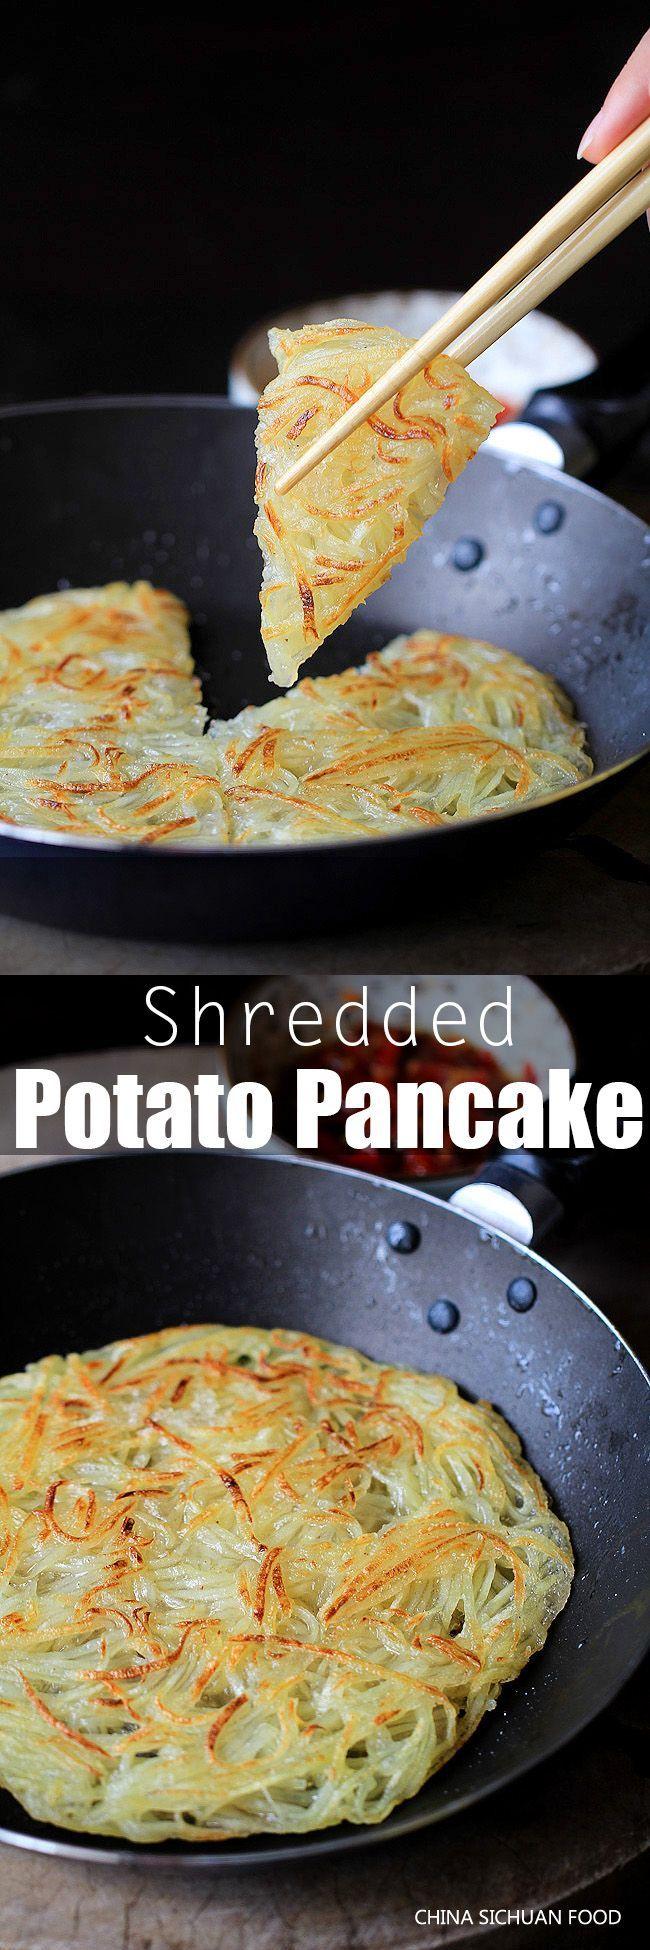 Chinese shredded potato pancake